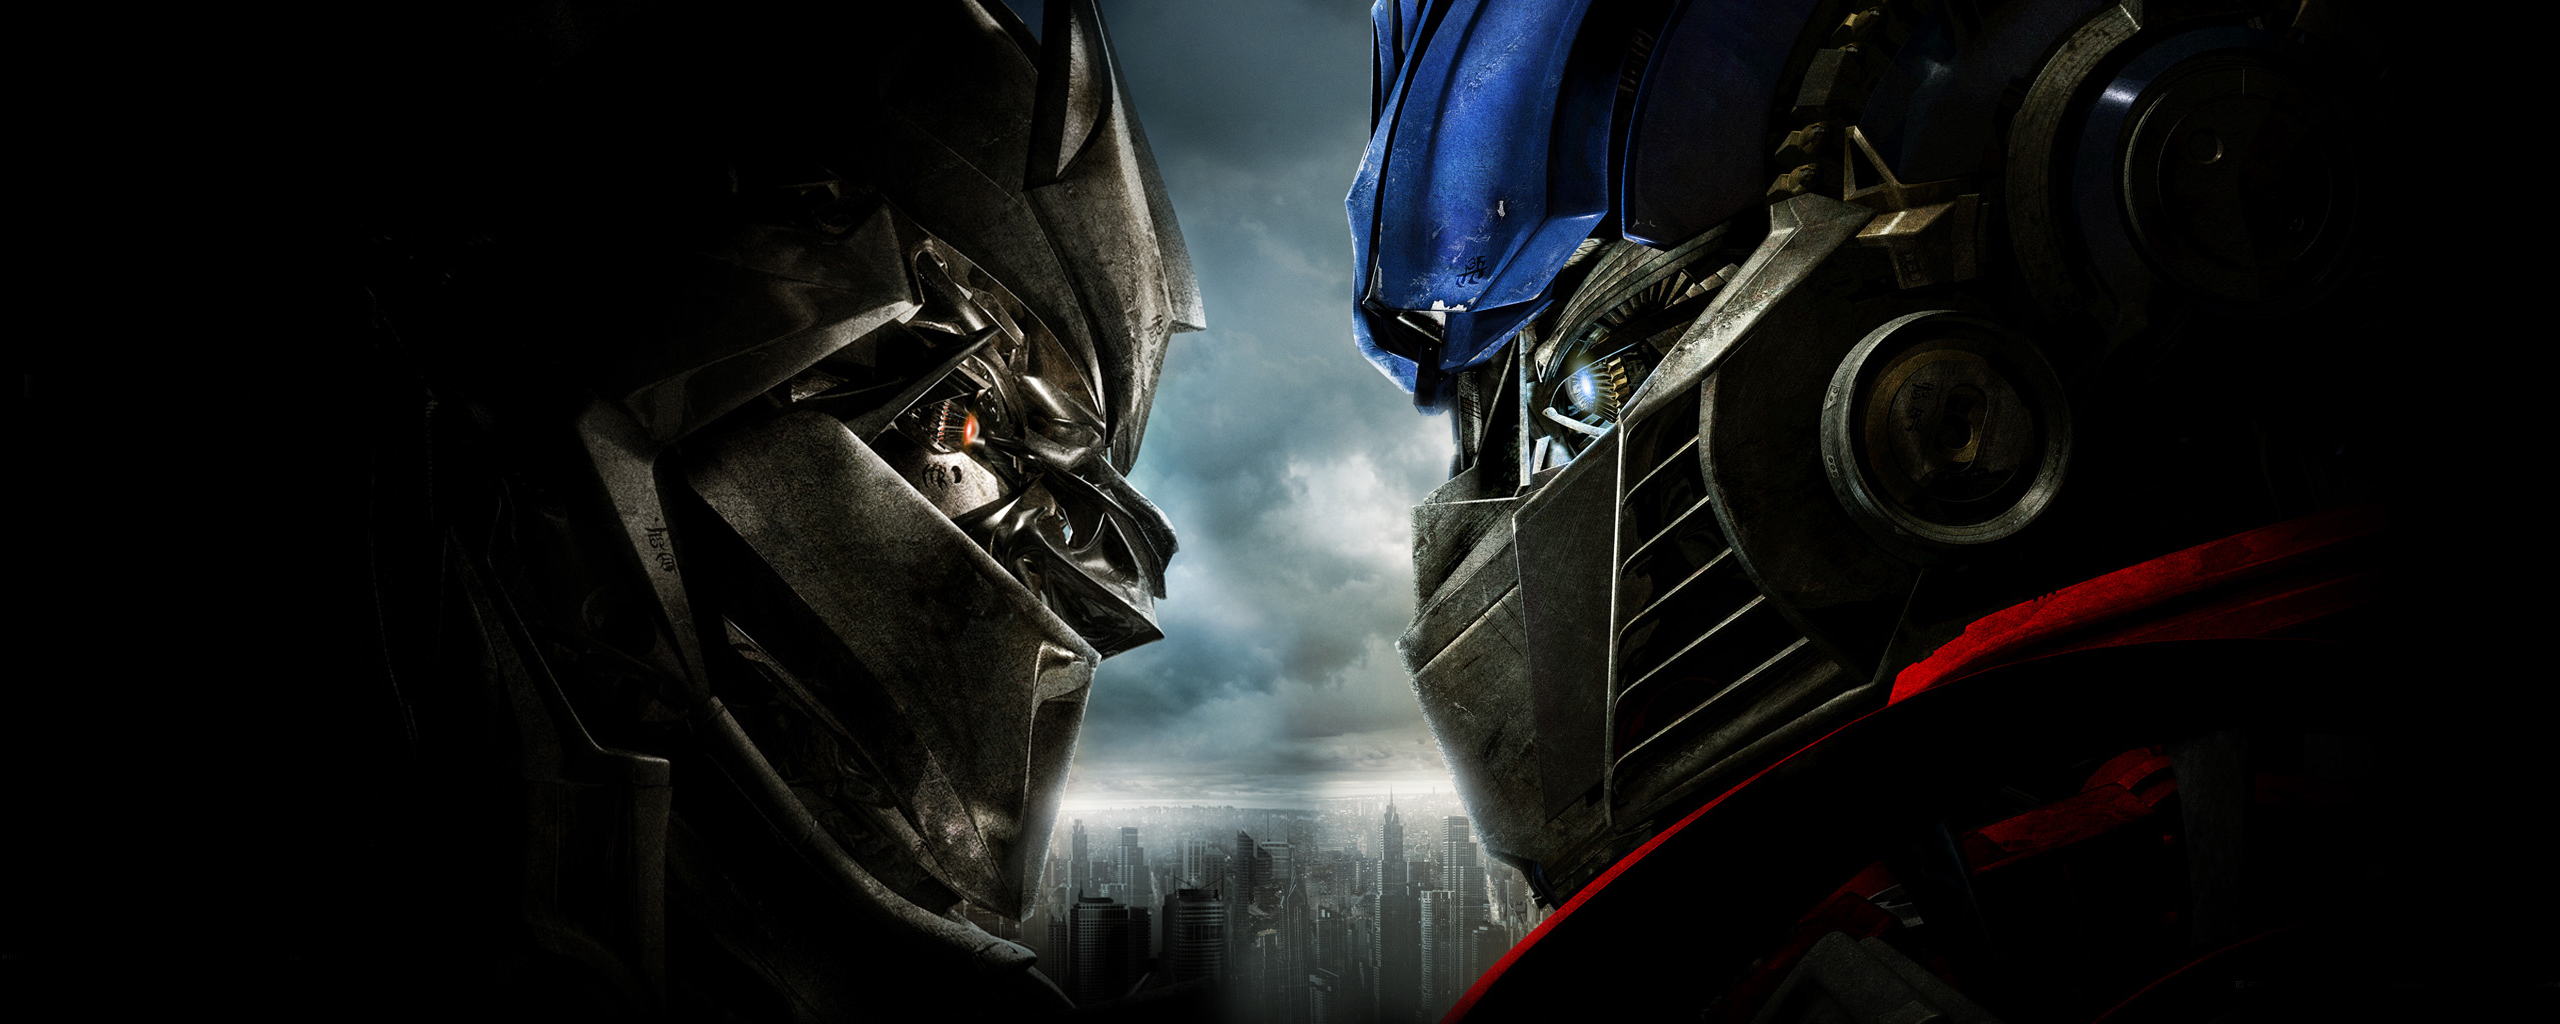 optimus prime megatron transformers 2 - revenge of the fallen